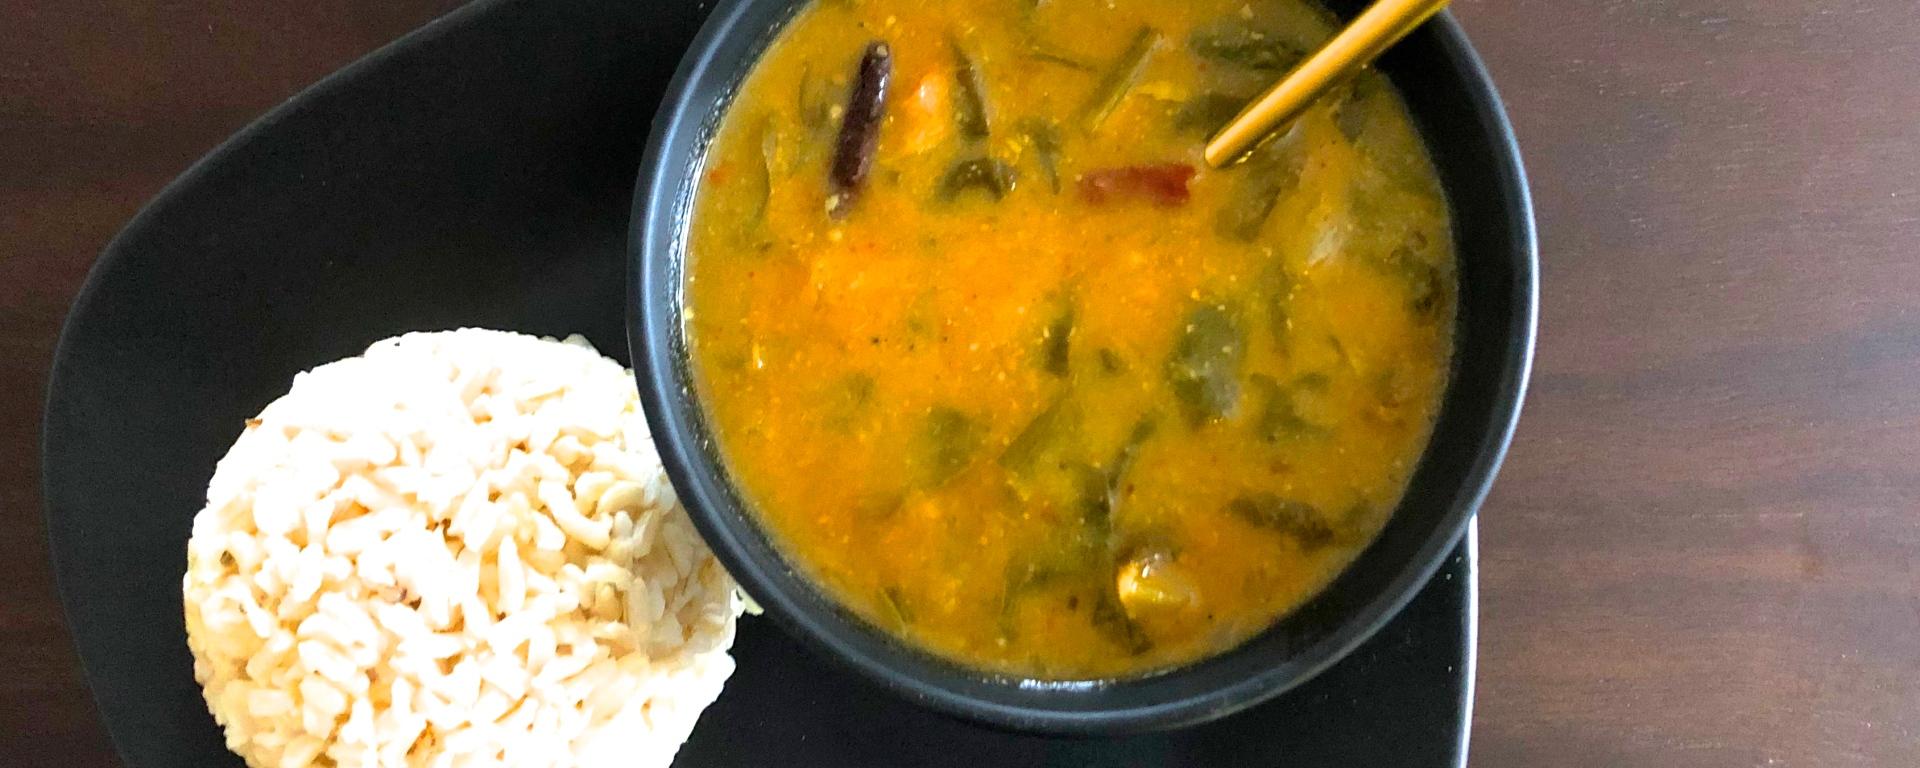 Healthy, vegan spinach lentils